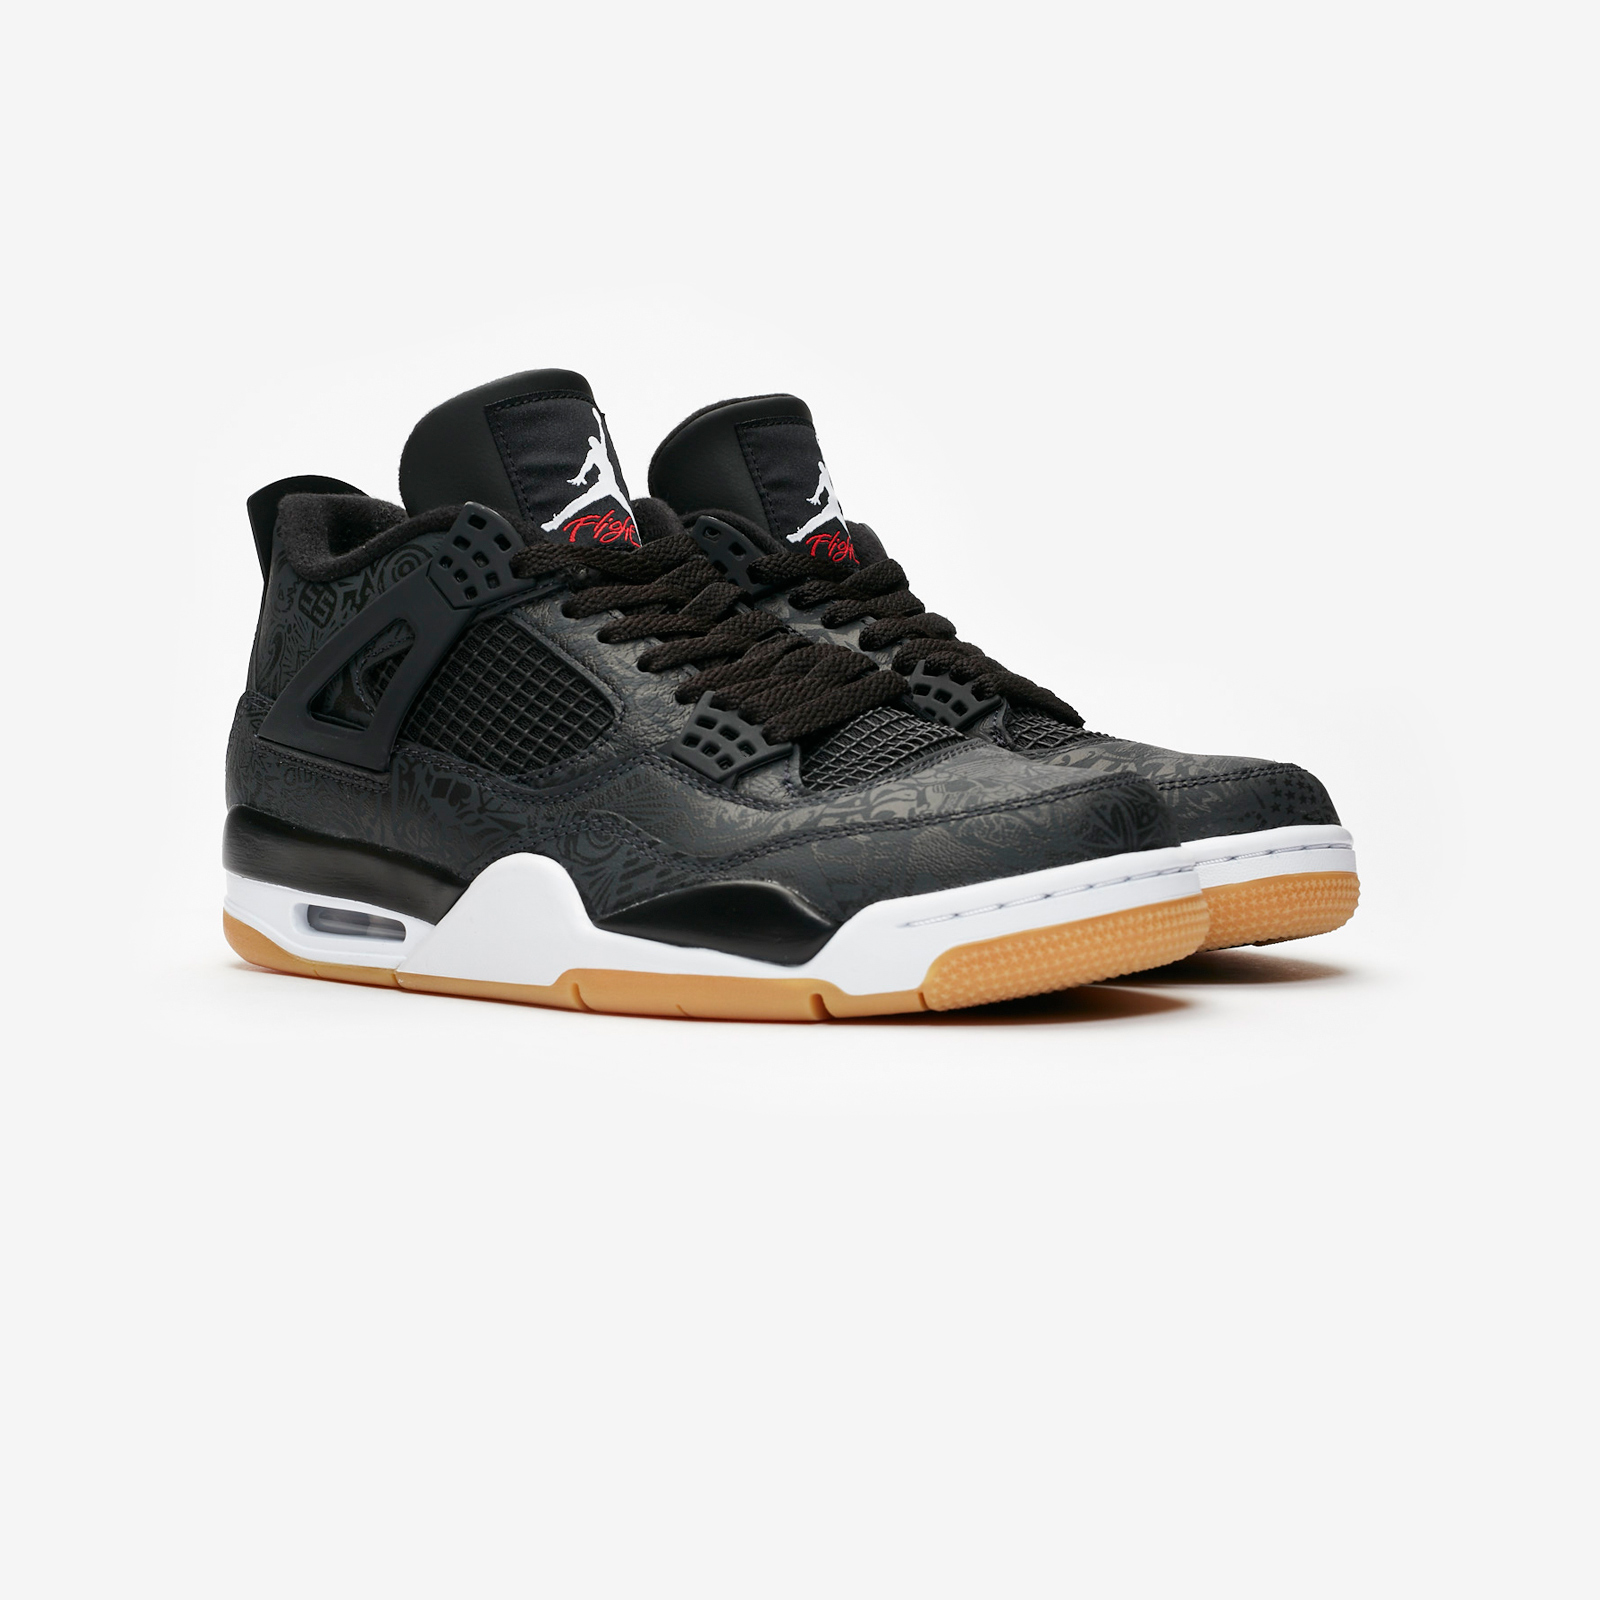 3ff702cd61d Jordan Brand Air Jordan 4 Retro SE - Ci1184-001 - Sneakersnstuff ...